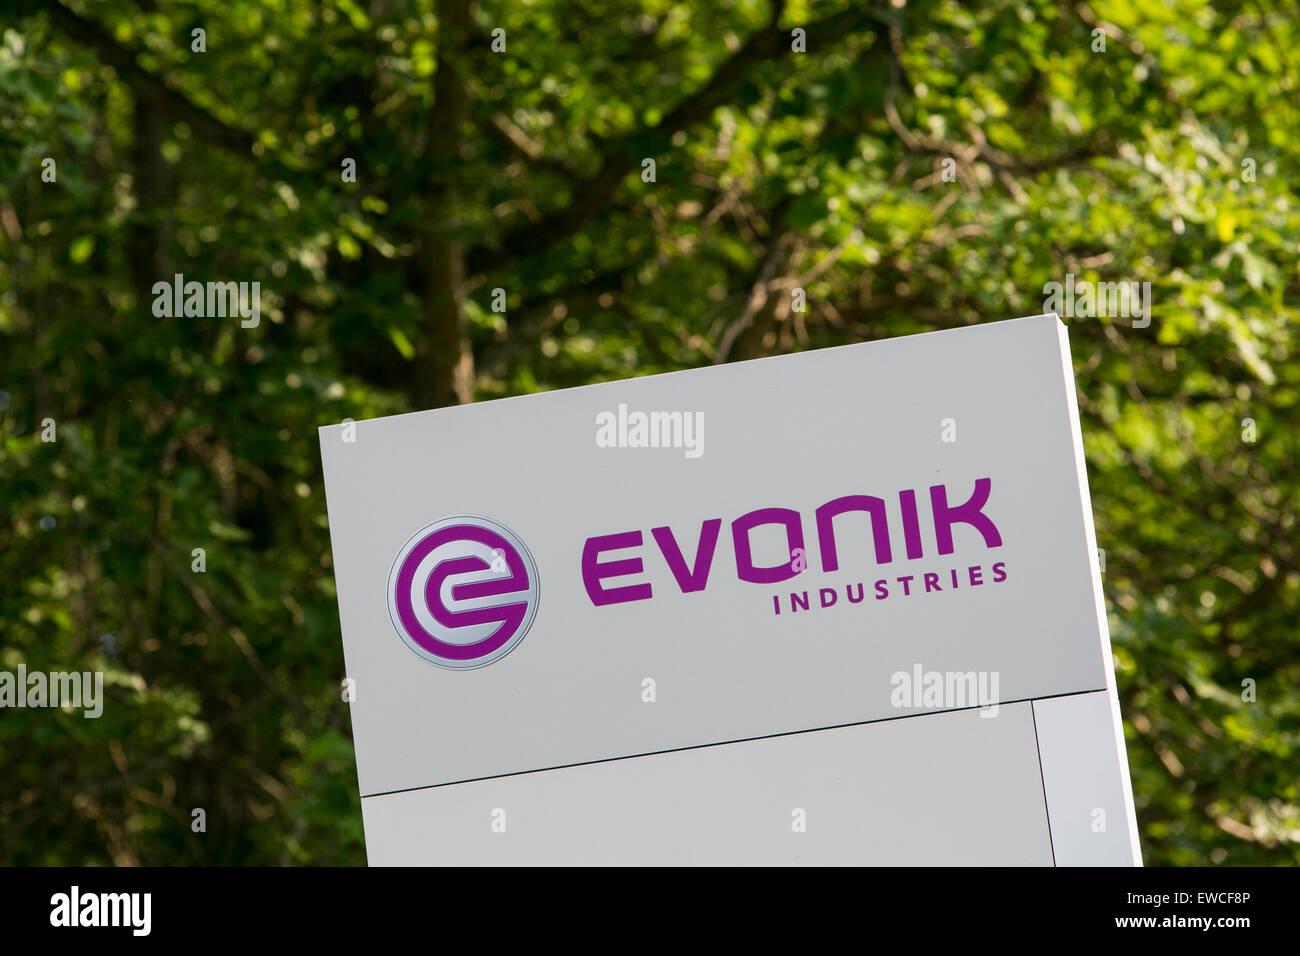 Evonik Industries Stock Photos & Evonik Industries Stock Images - Alamy